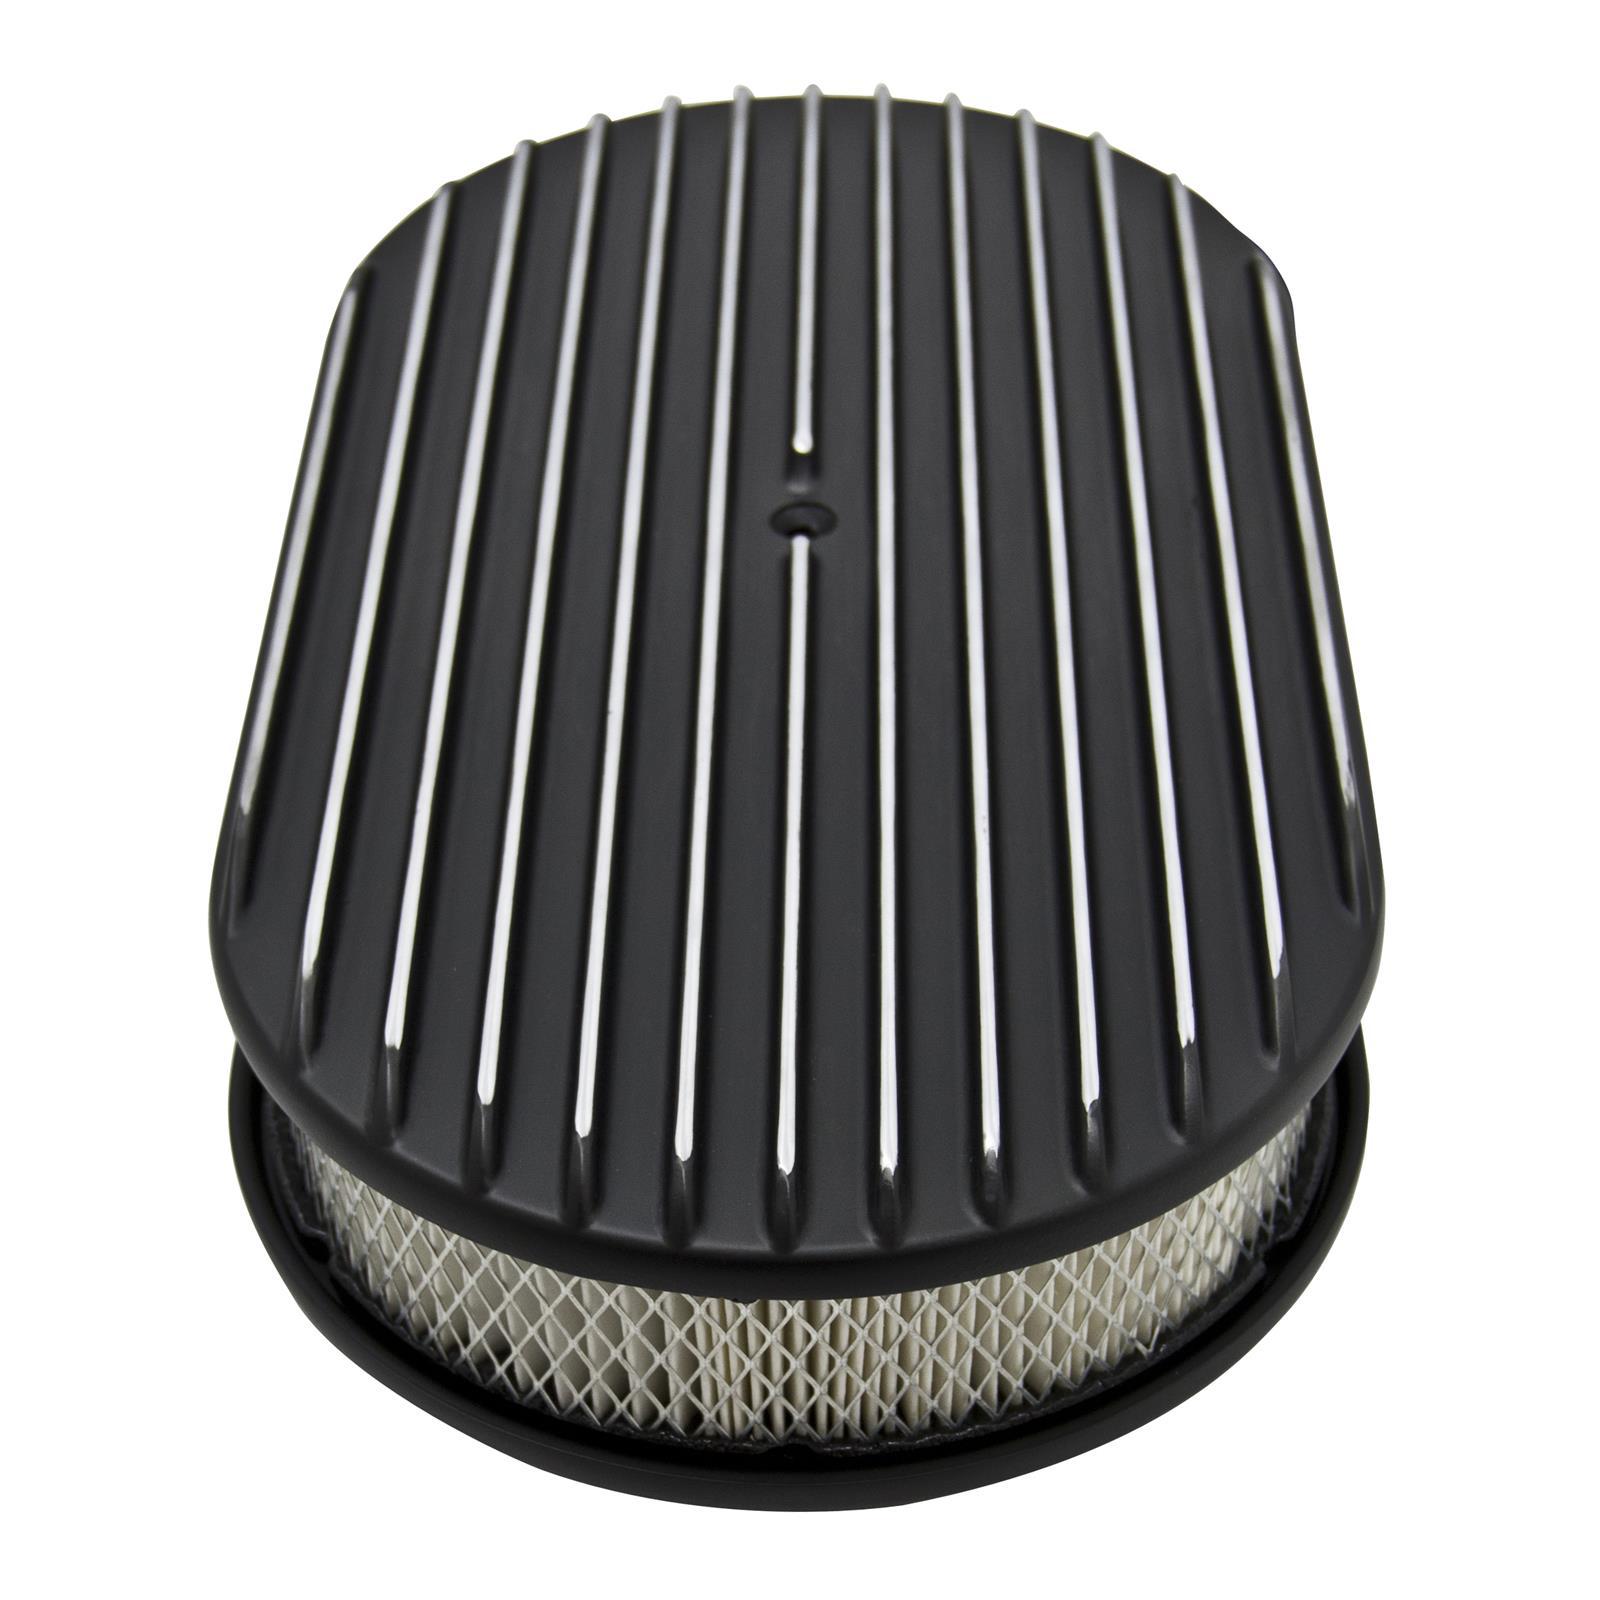 Cal Custom Air Cleaner : Cal custom™ finned aluminum air cleaners b